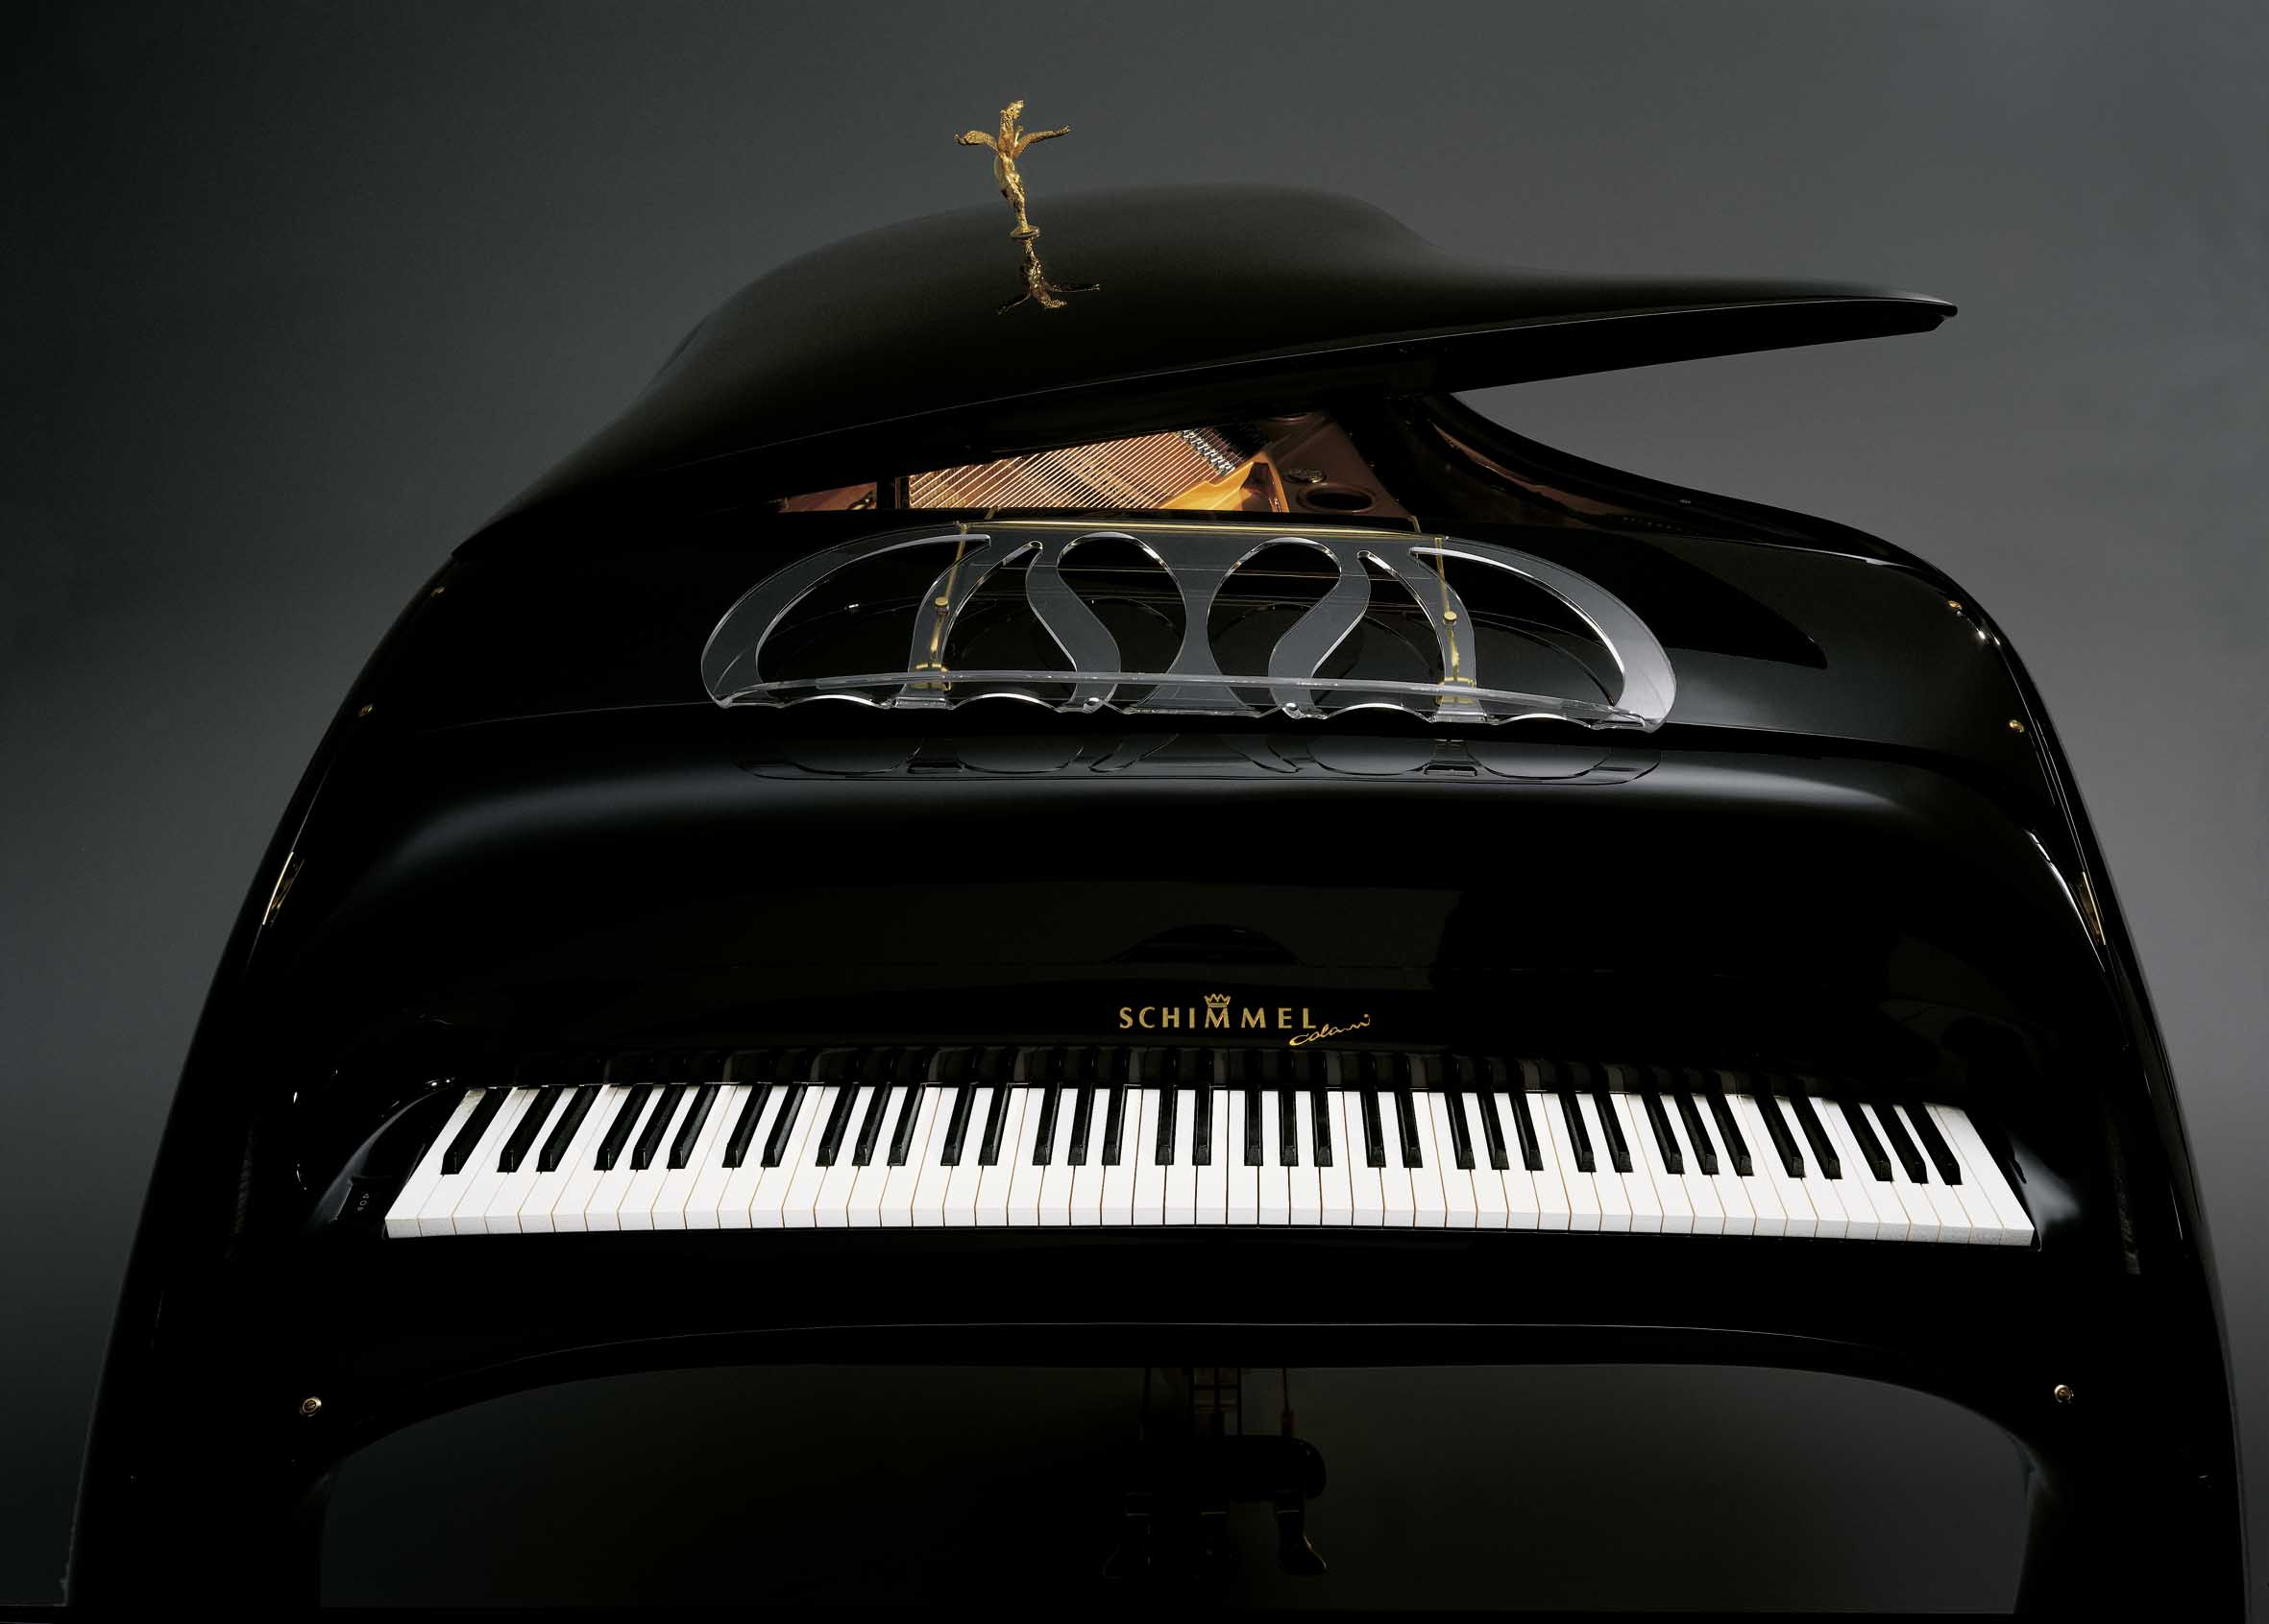 Welcome to Schimmel Pianos Australia